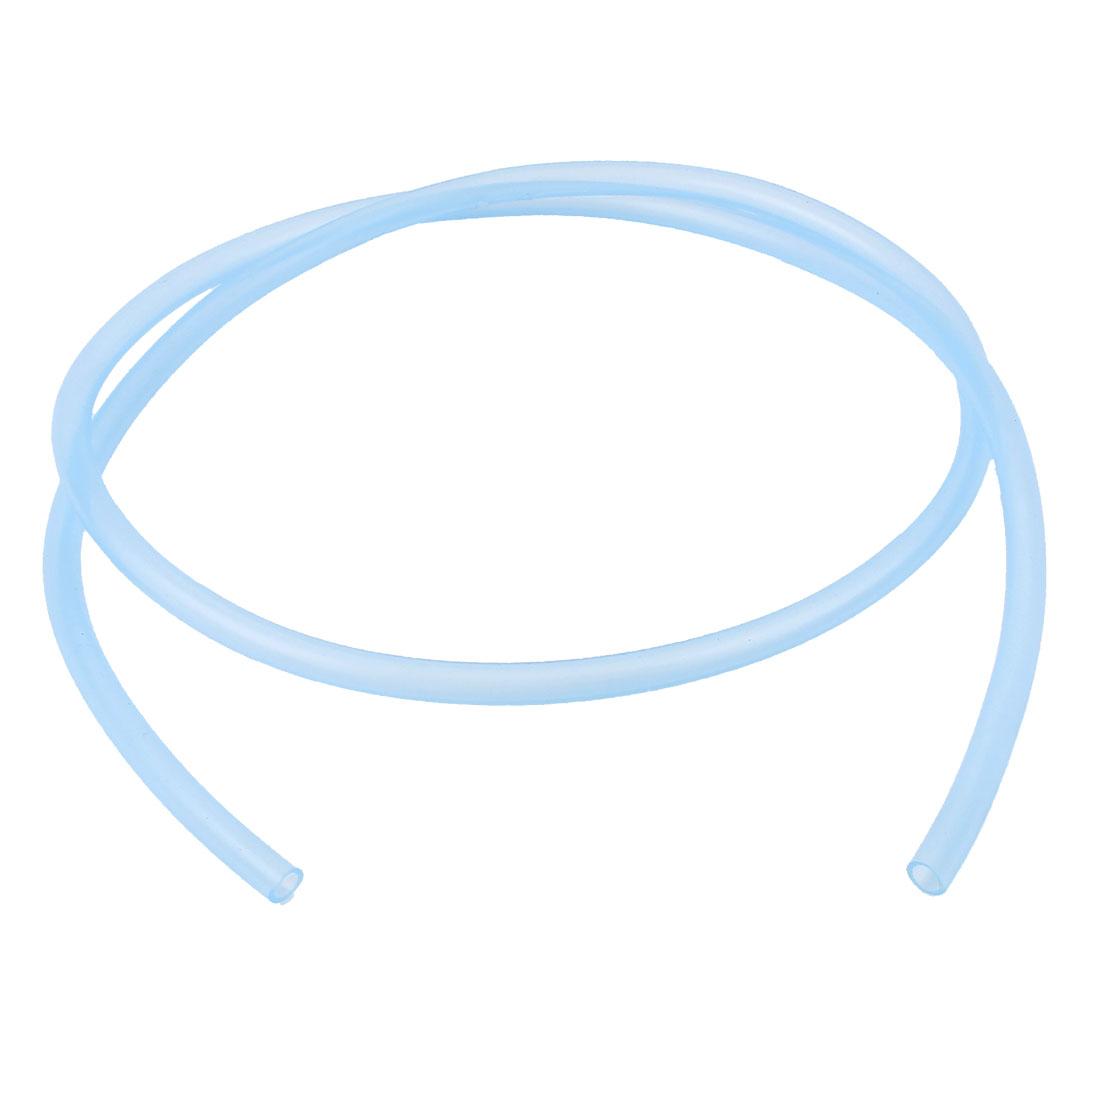 5mm ID x 7mm OD Flexible Hose Silicone Tubing Tube 1M Length